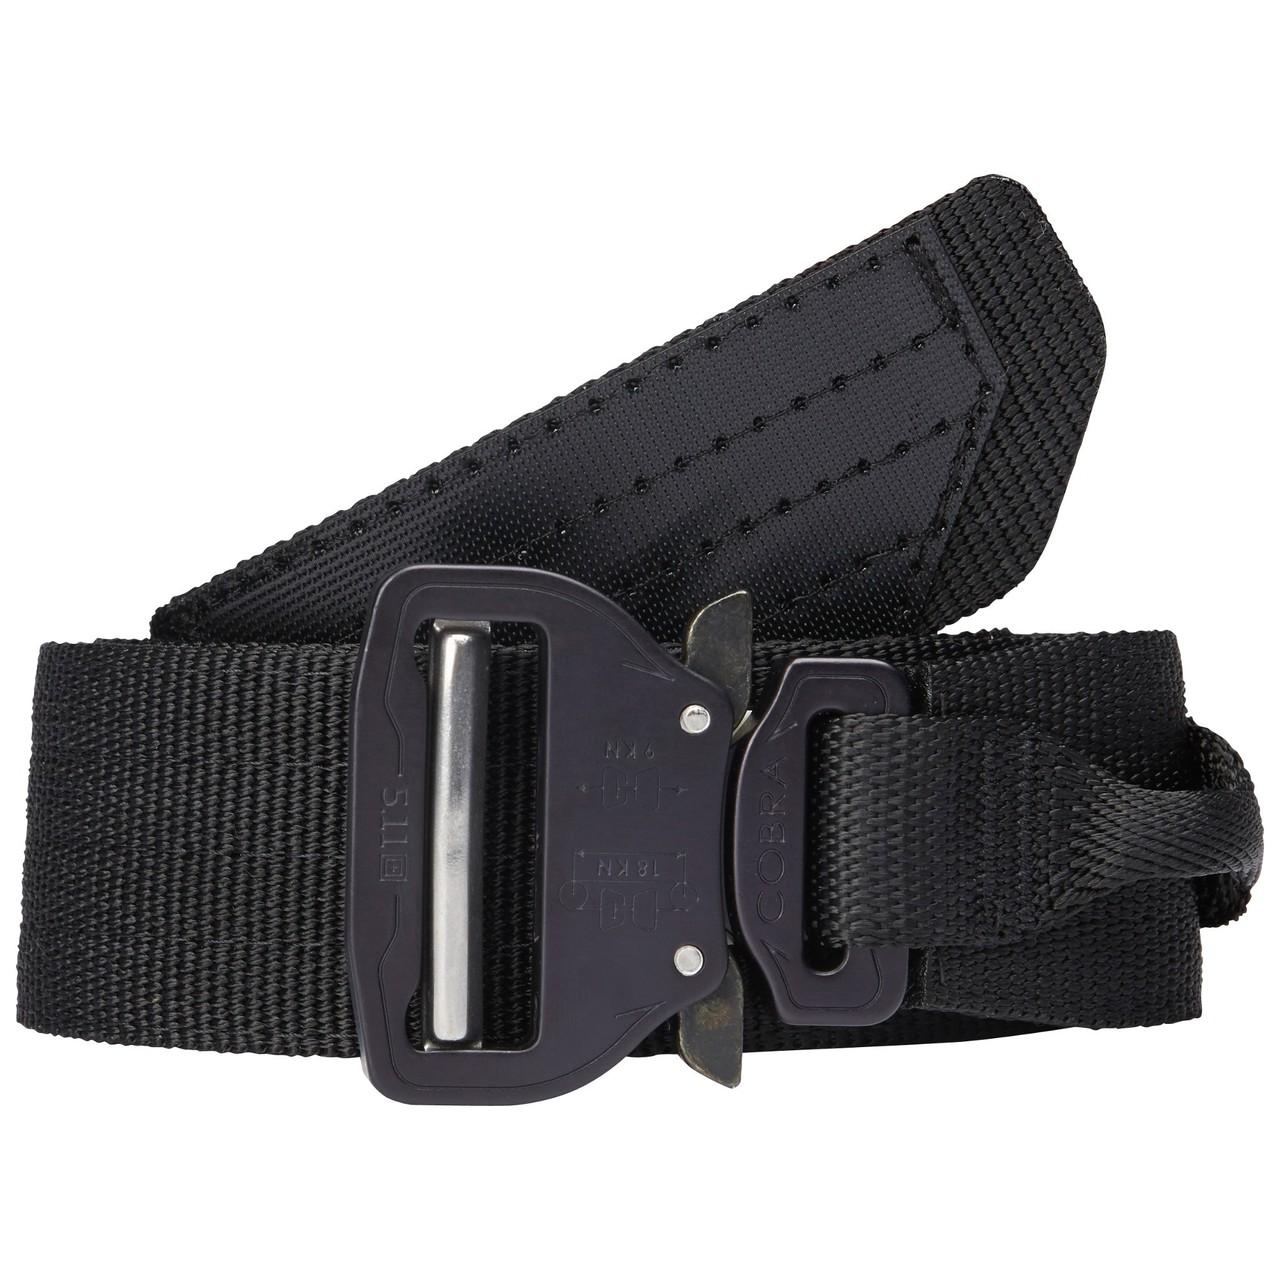 215 Gear Ultimate Riggers Belt